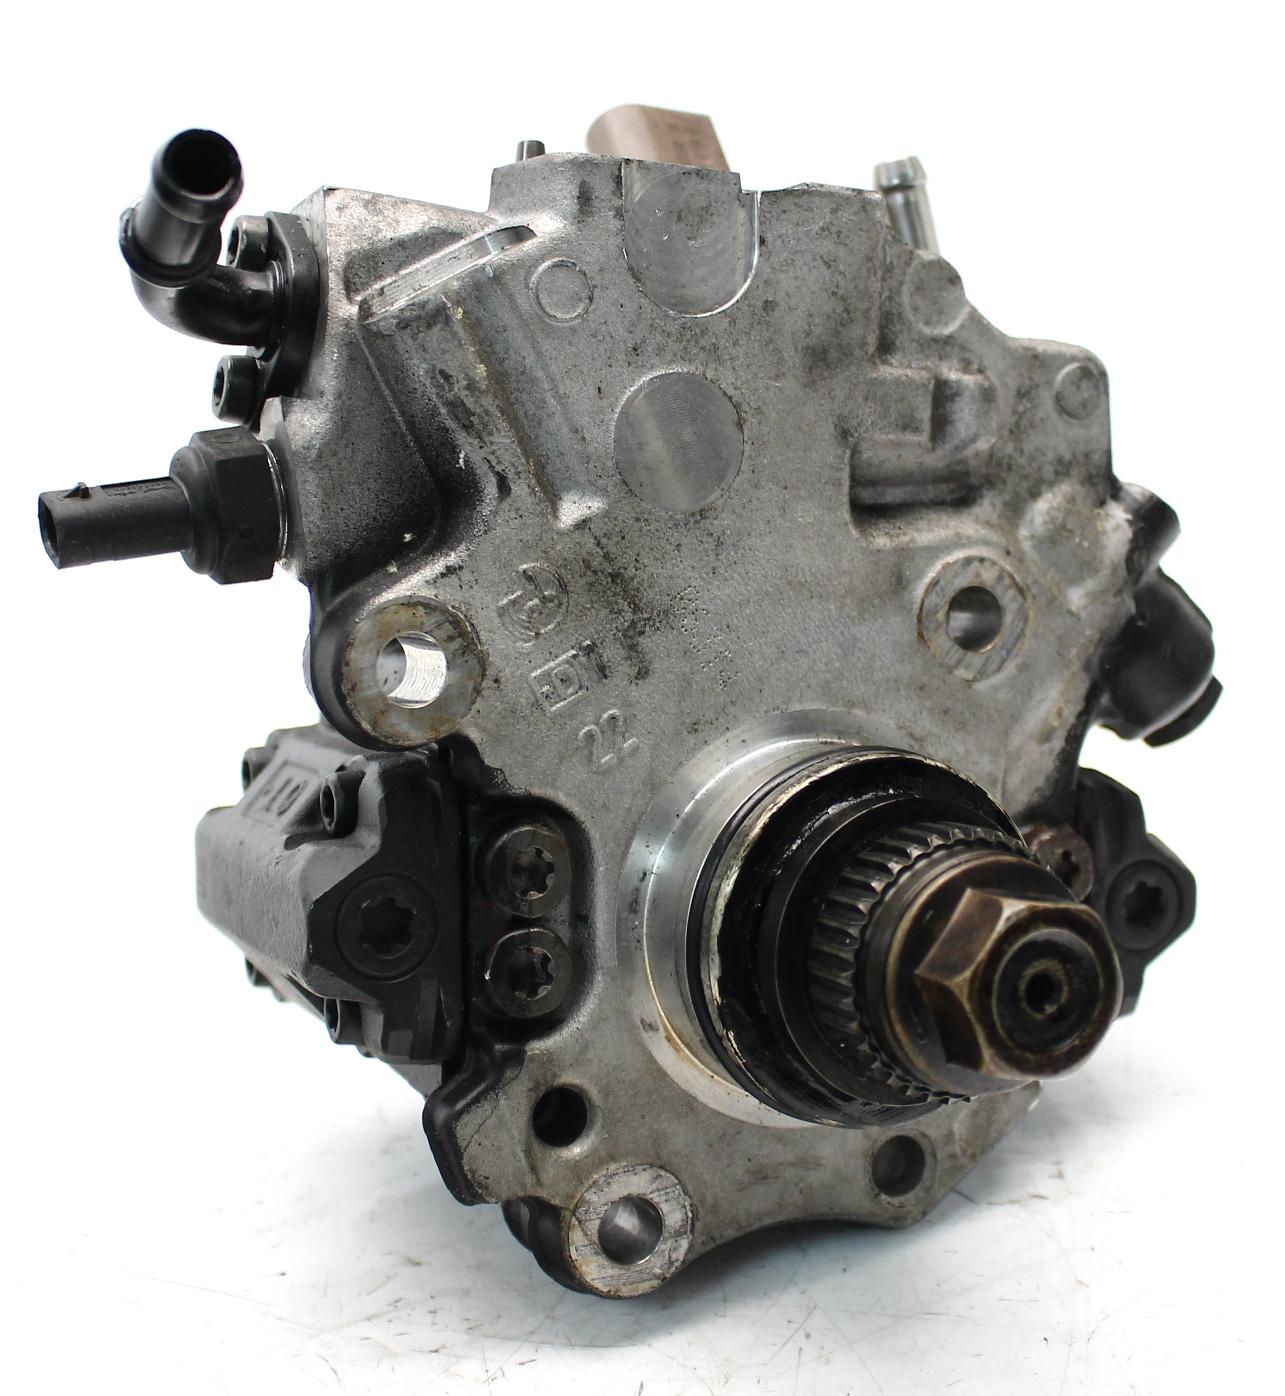 Hochdruckpumpe Mercedes 2,2 CDI OM651 A6510703101 A6510702901 A6510700900